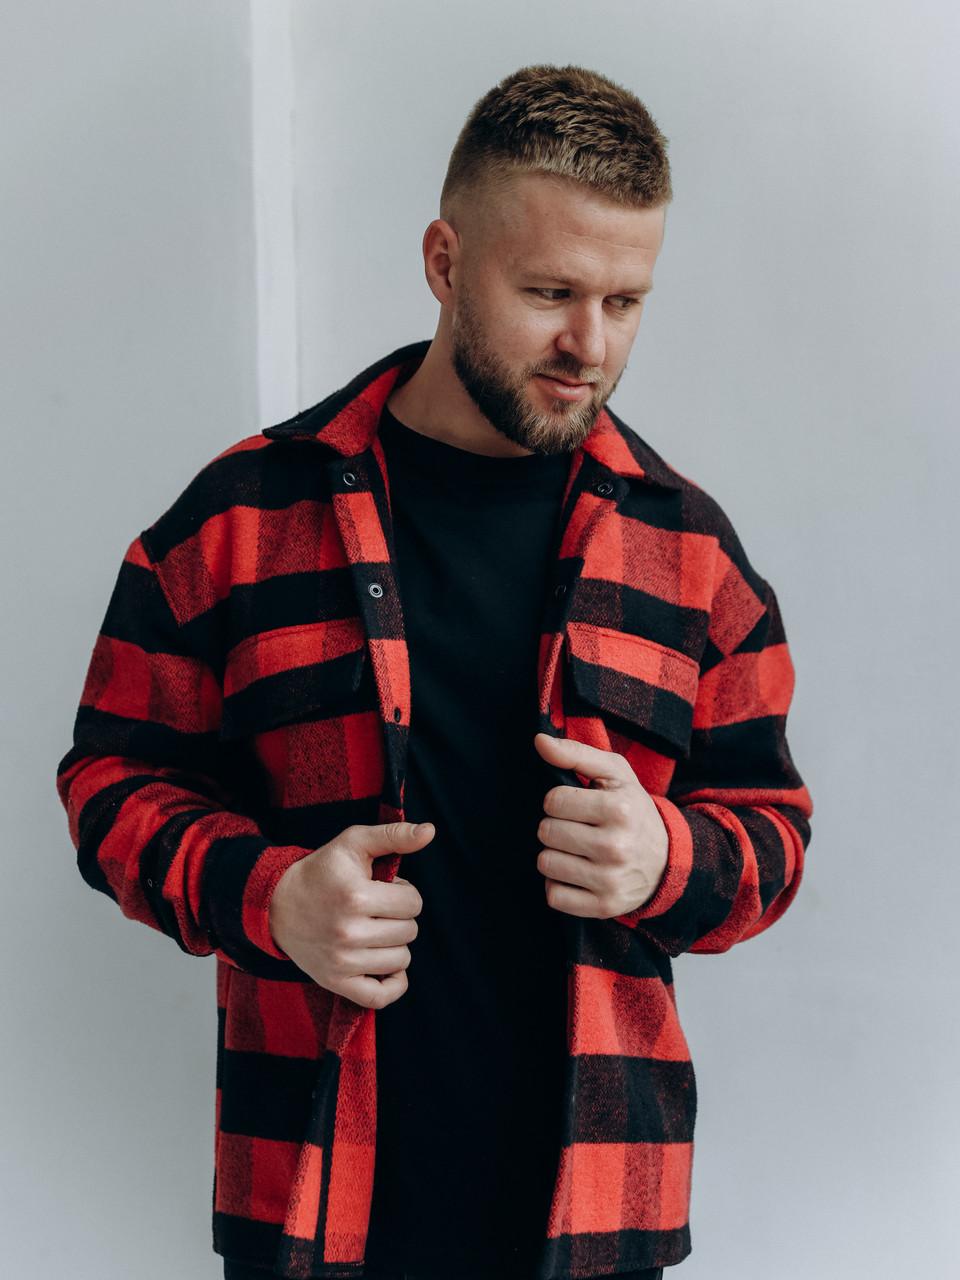 Картата чоловіча тепла байкова куртка-сорочка на гудзиках з кишенями червоно-чорна